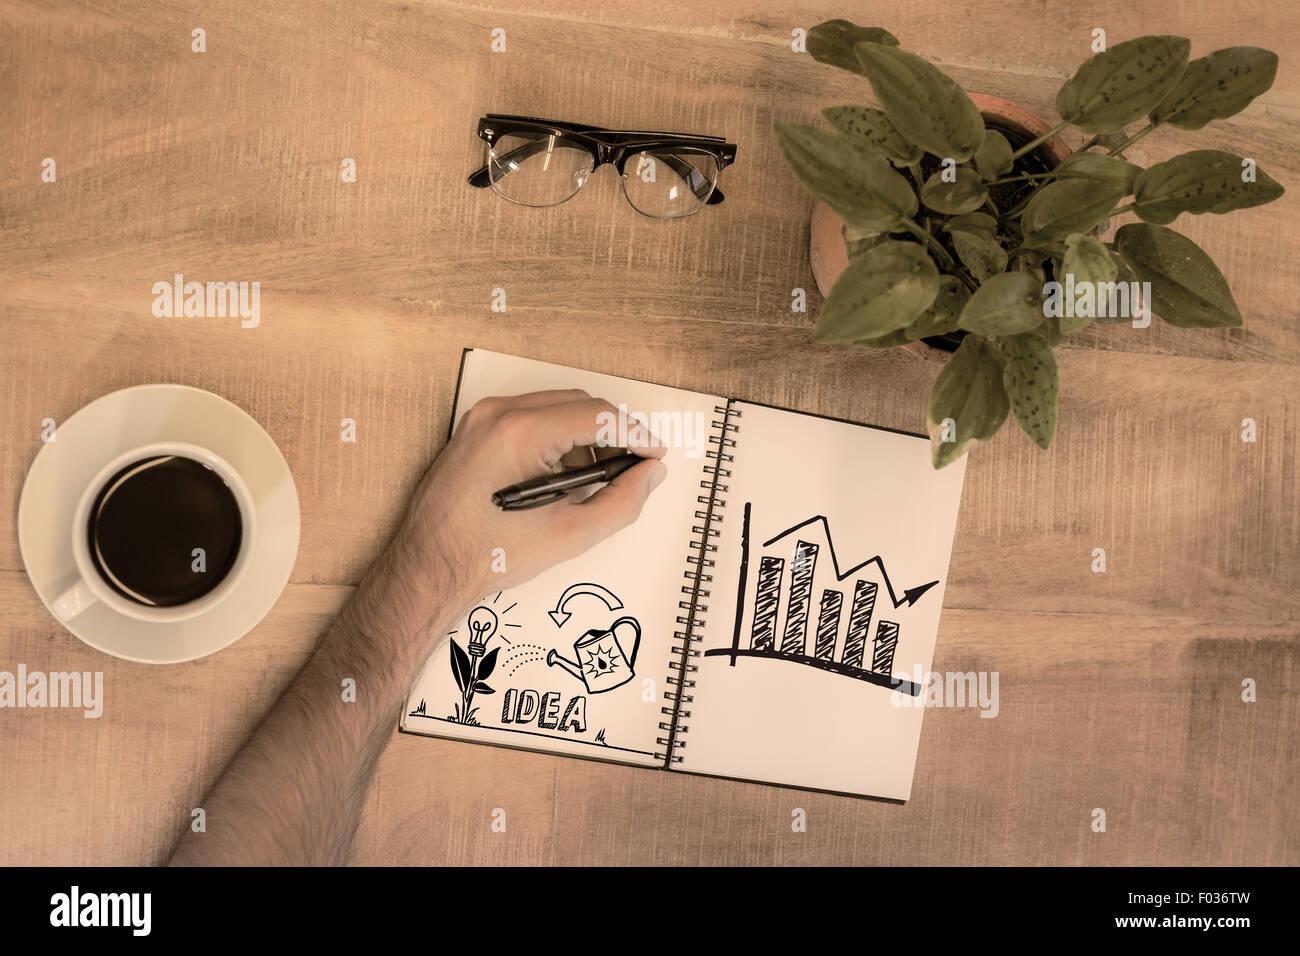 Imagen compuesta de idea e innovación gráfico Imagen De Stock